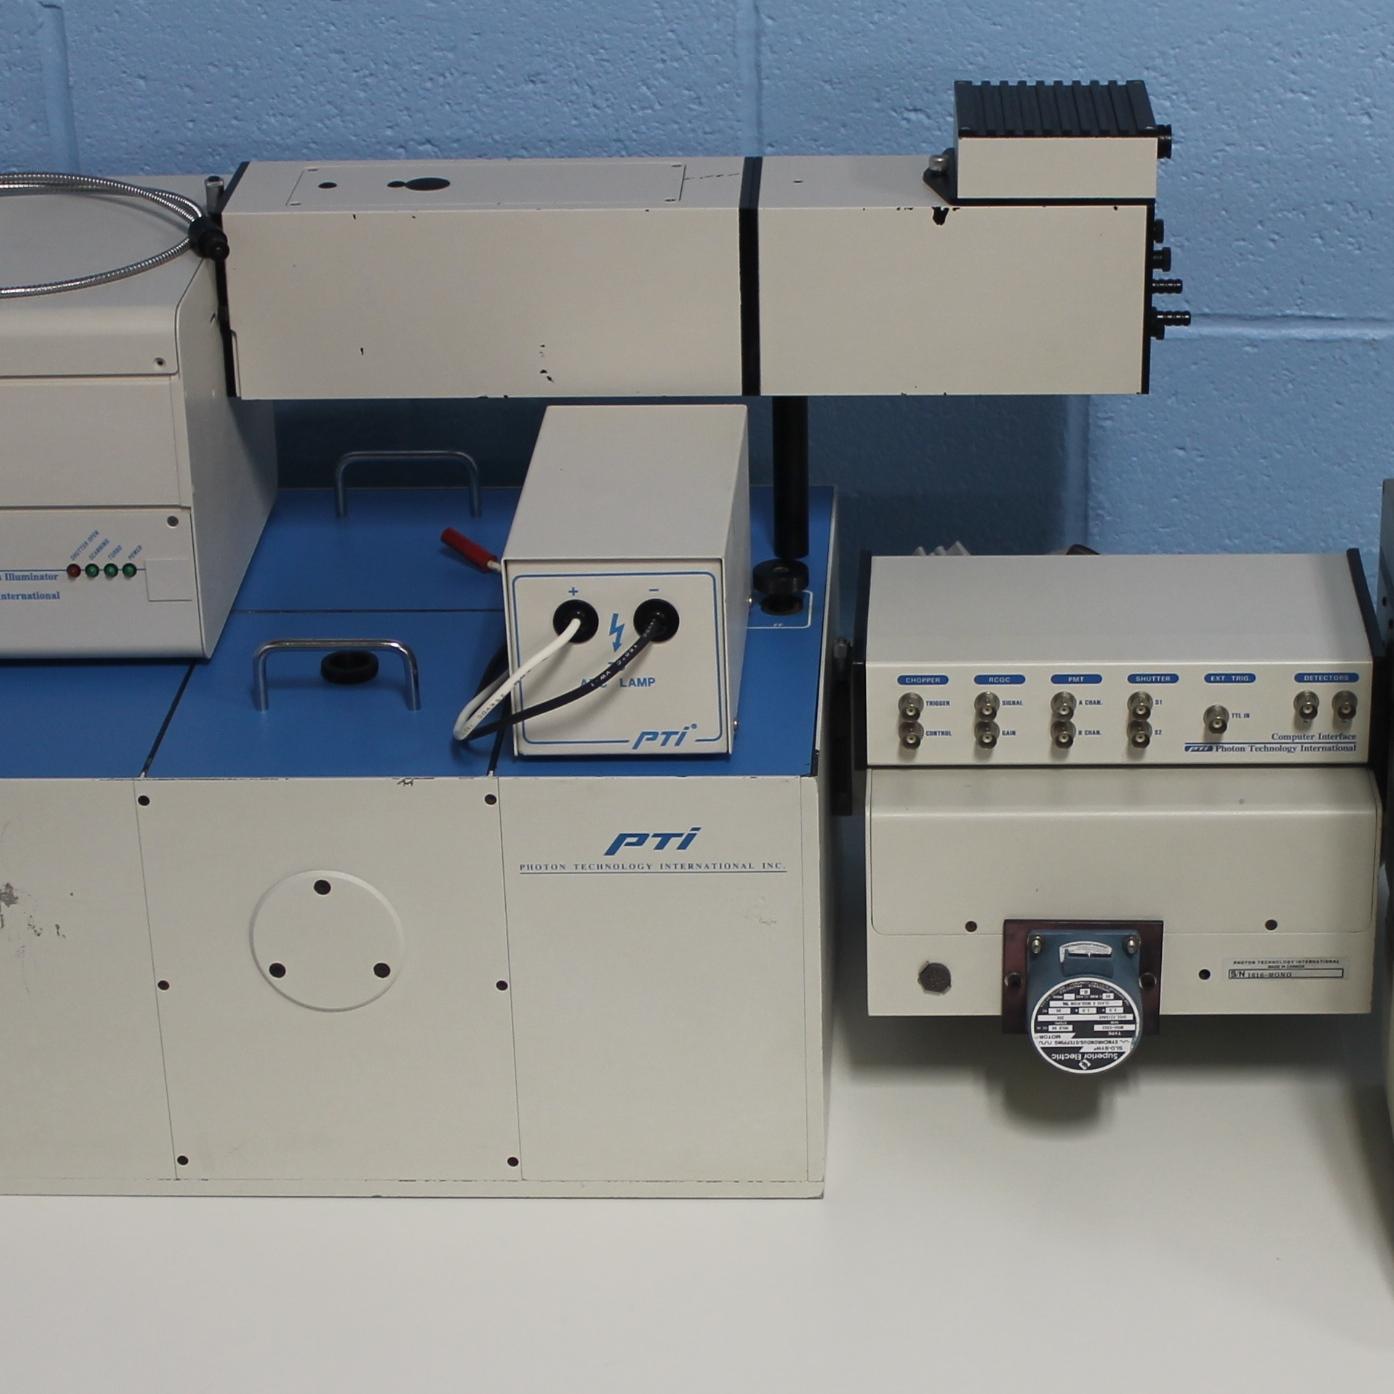 Photon Technology International PTI QuantaMaster Fluorescence/Luminescence Spectrometer Image